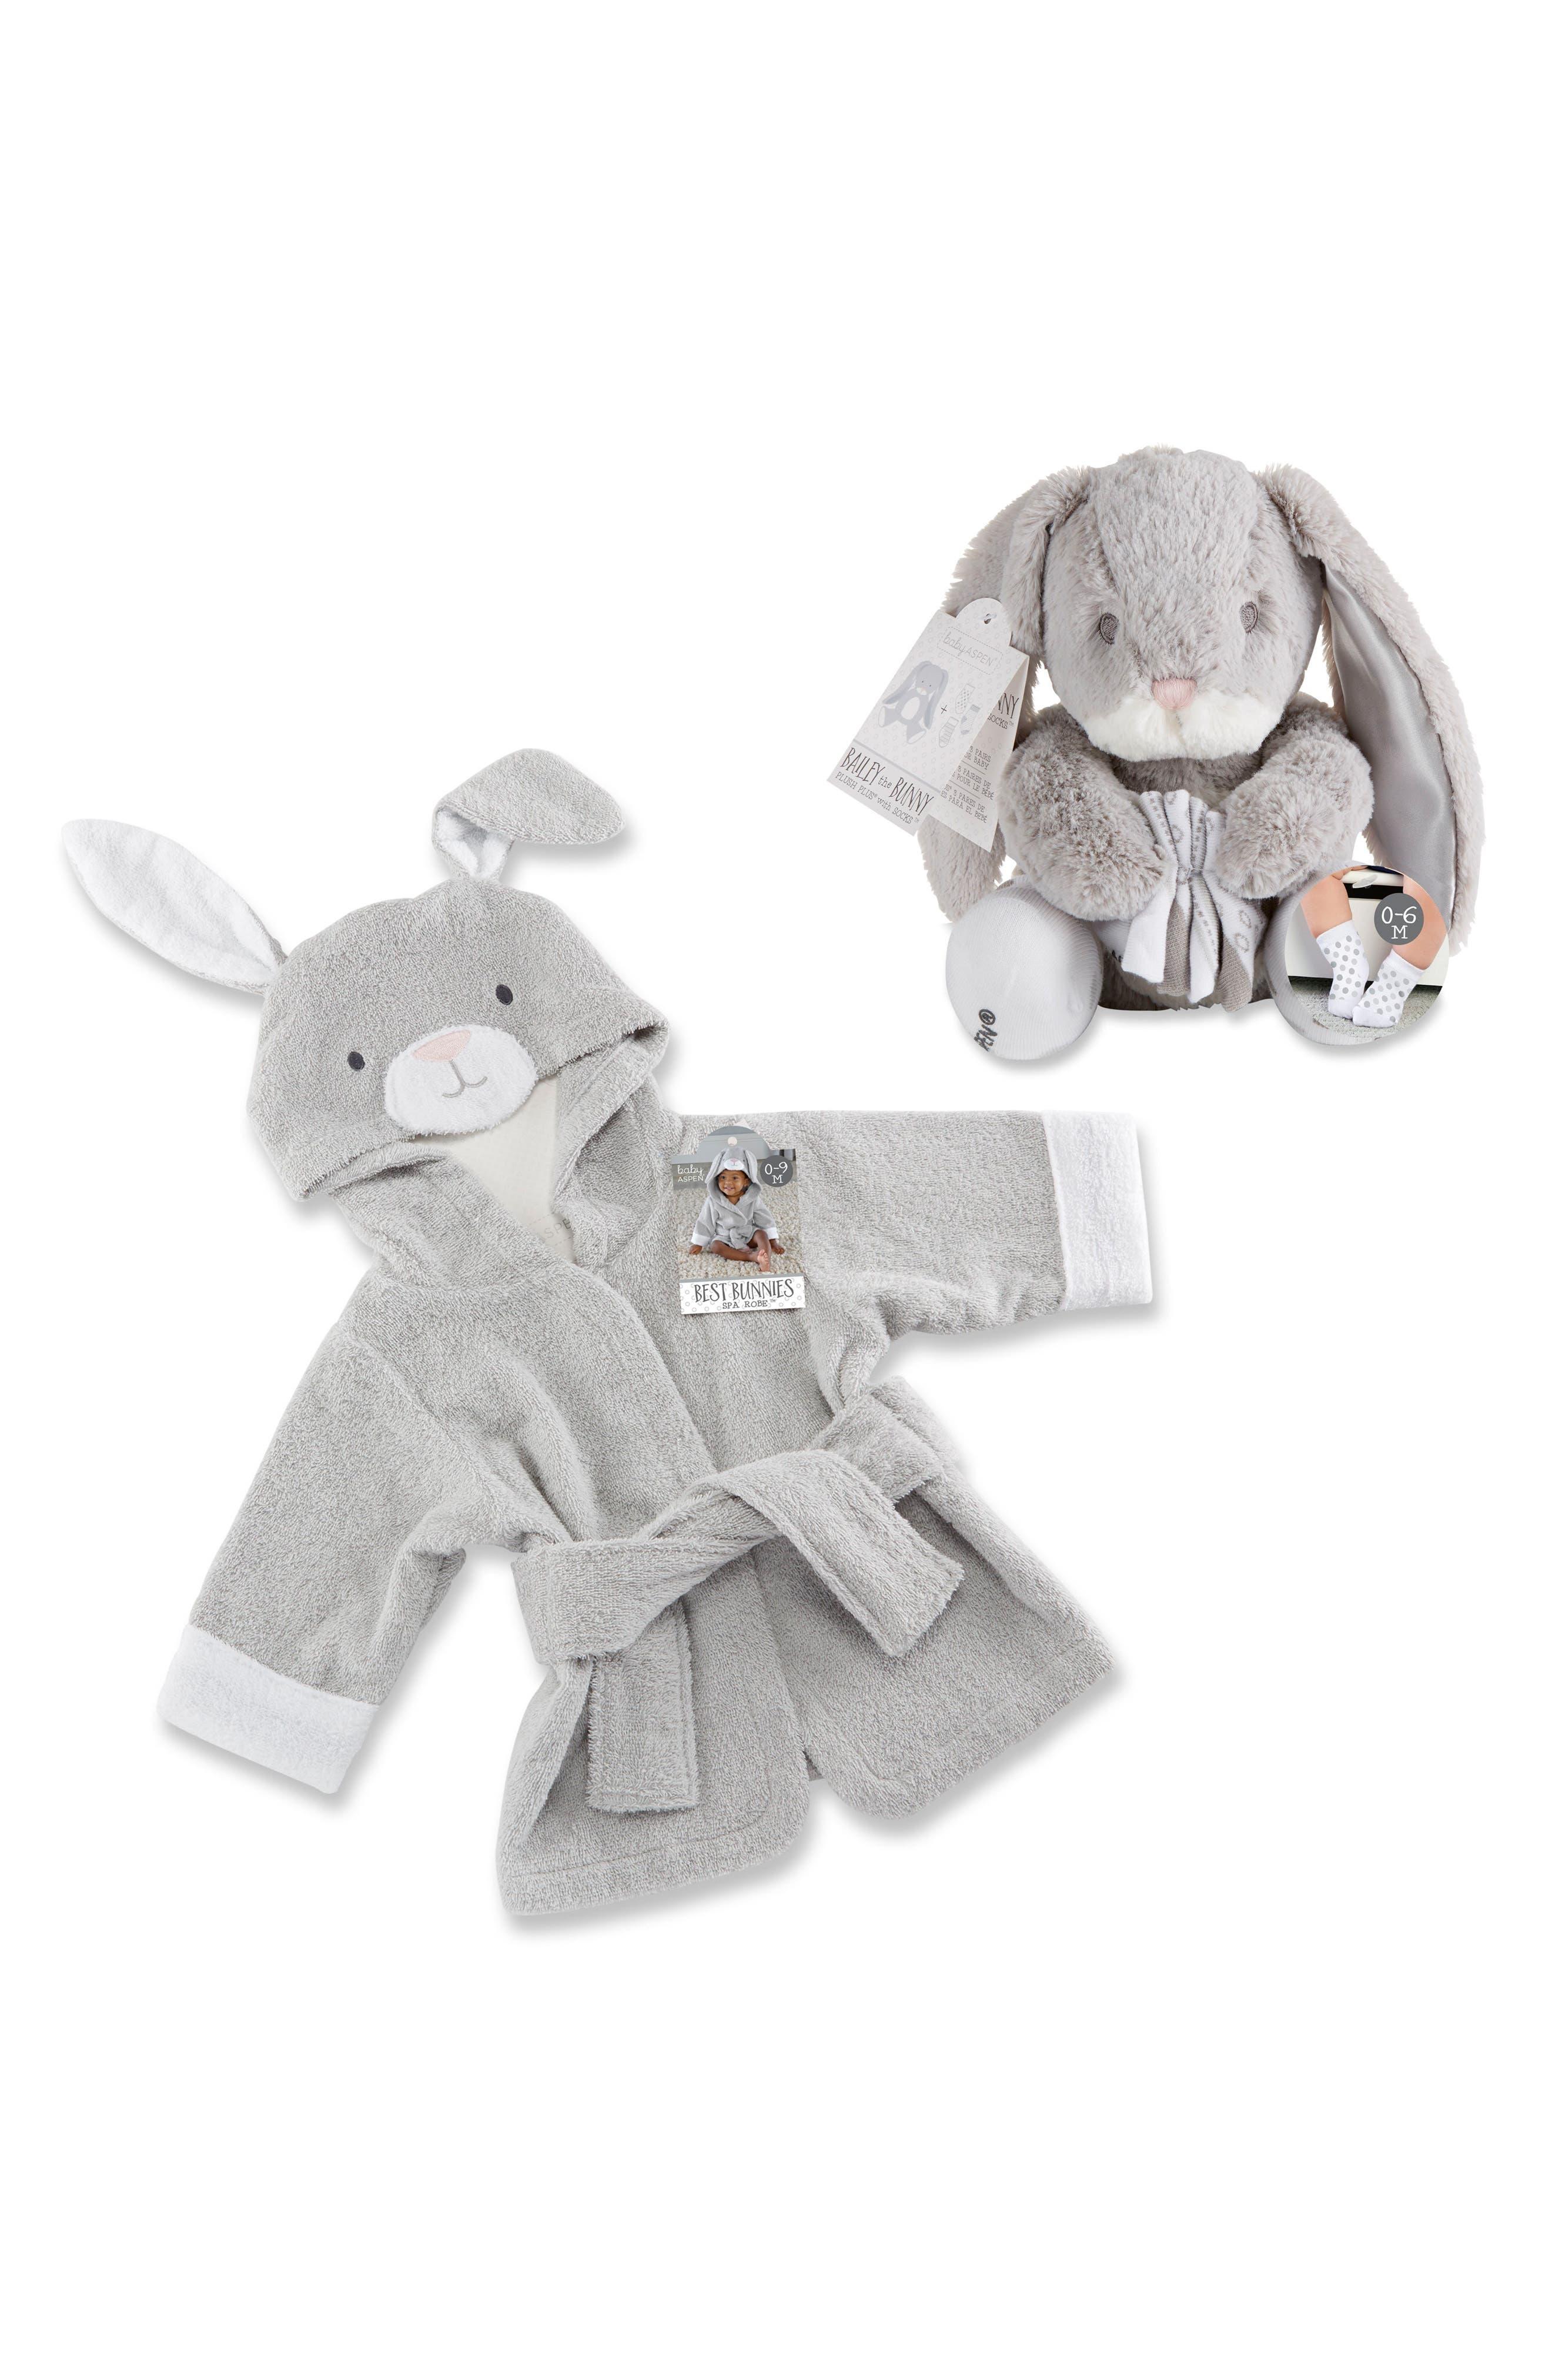 Bunnie Hooded Robe & Stuffed Animal,                             Main thumbnail 1, color,                             GRAY